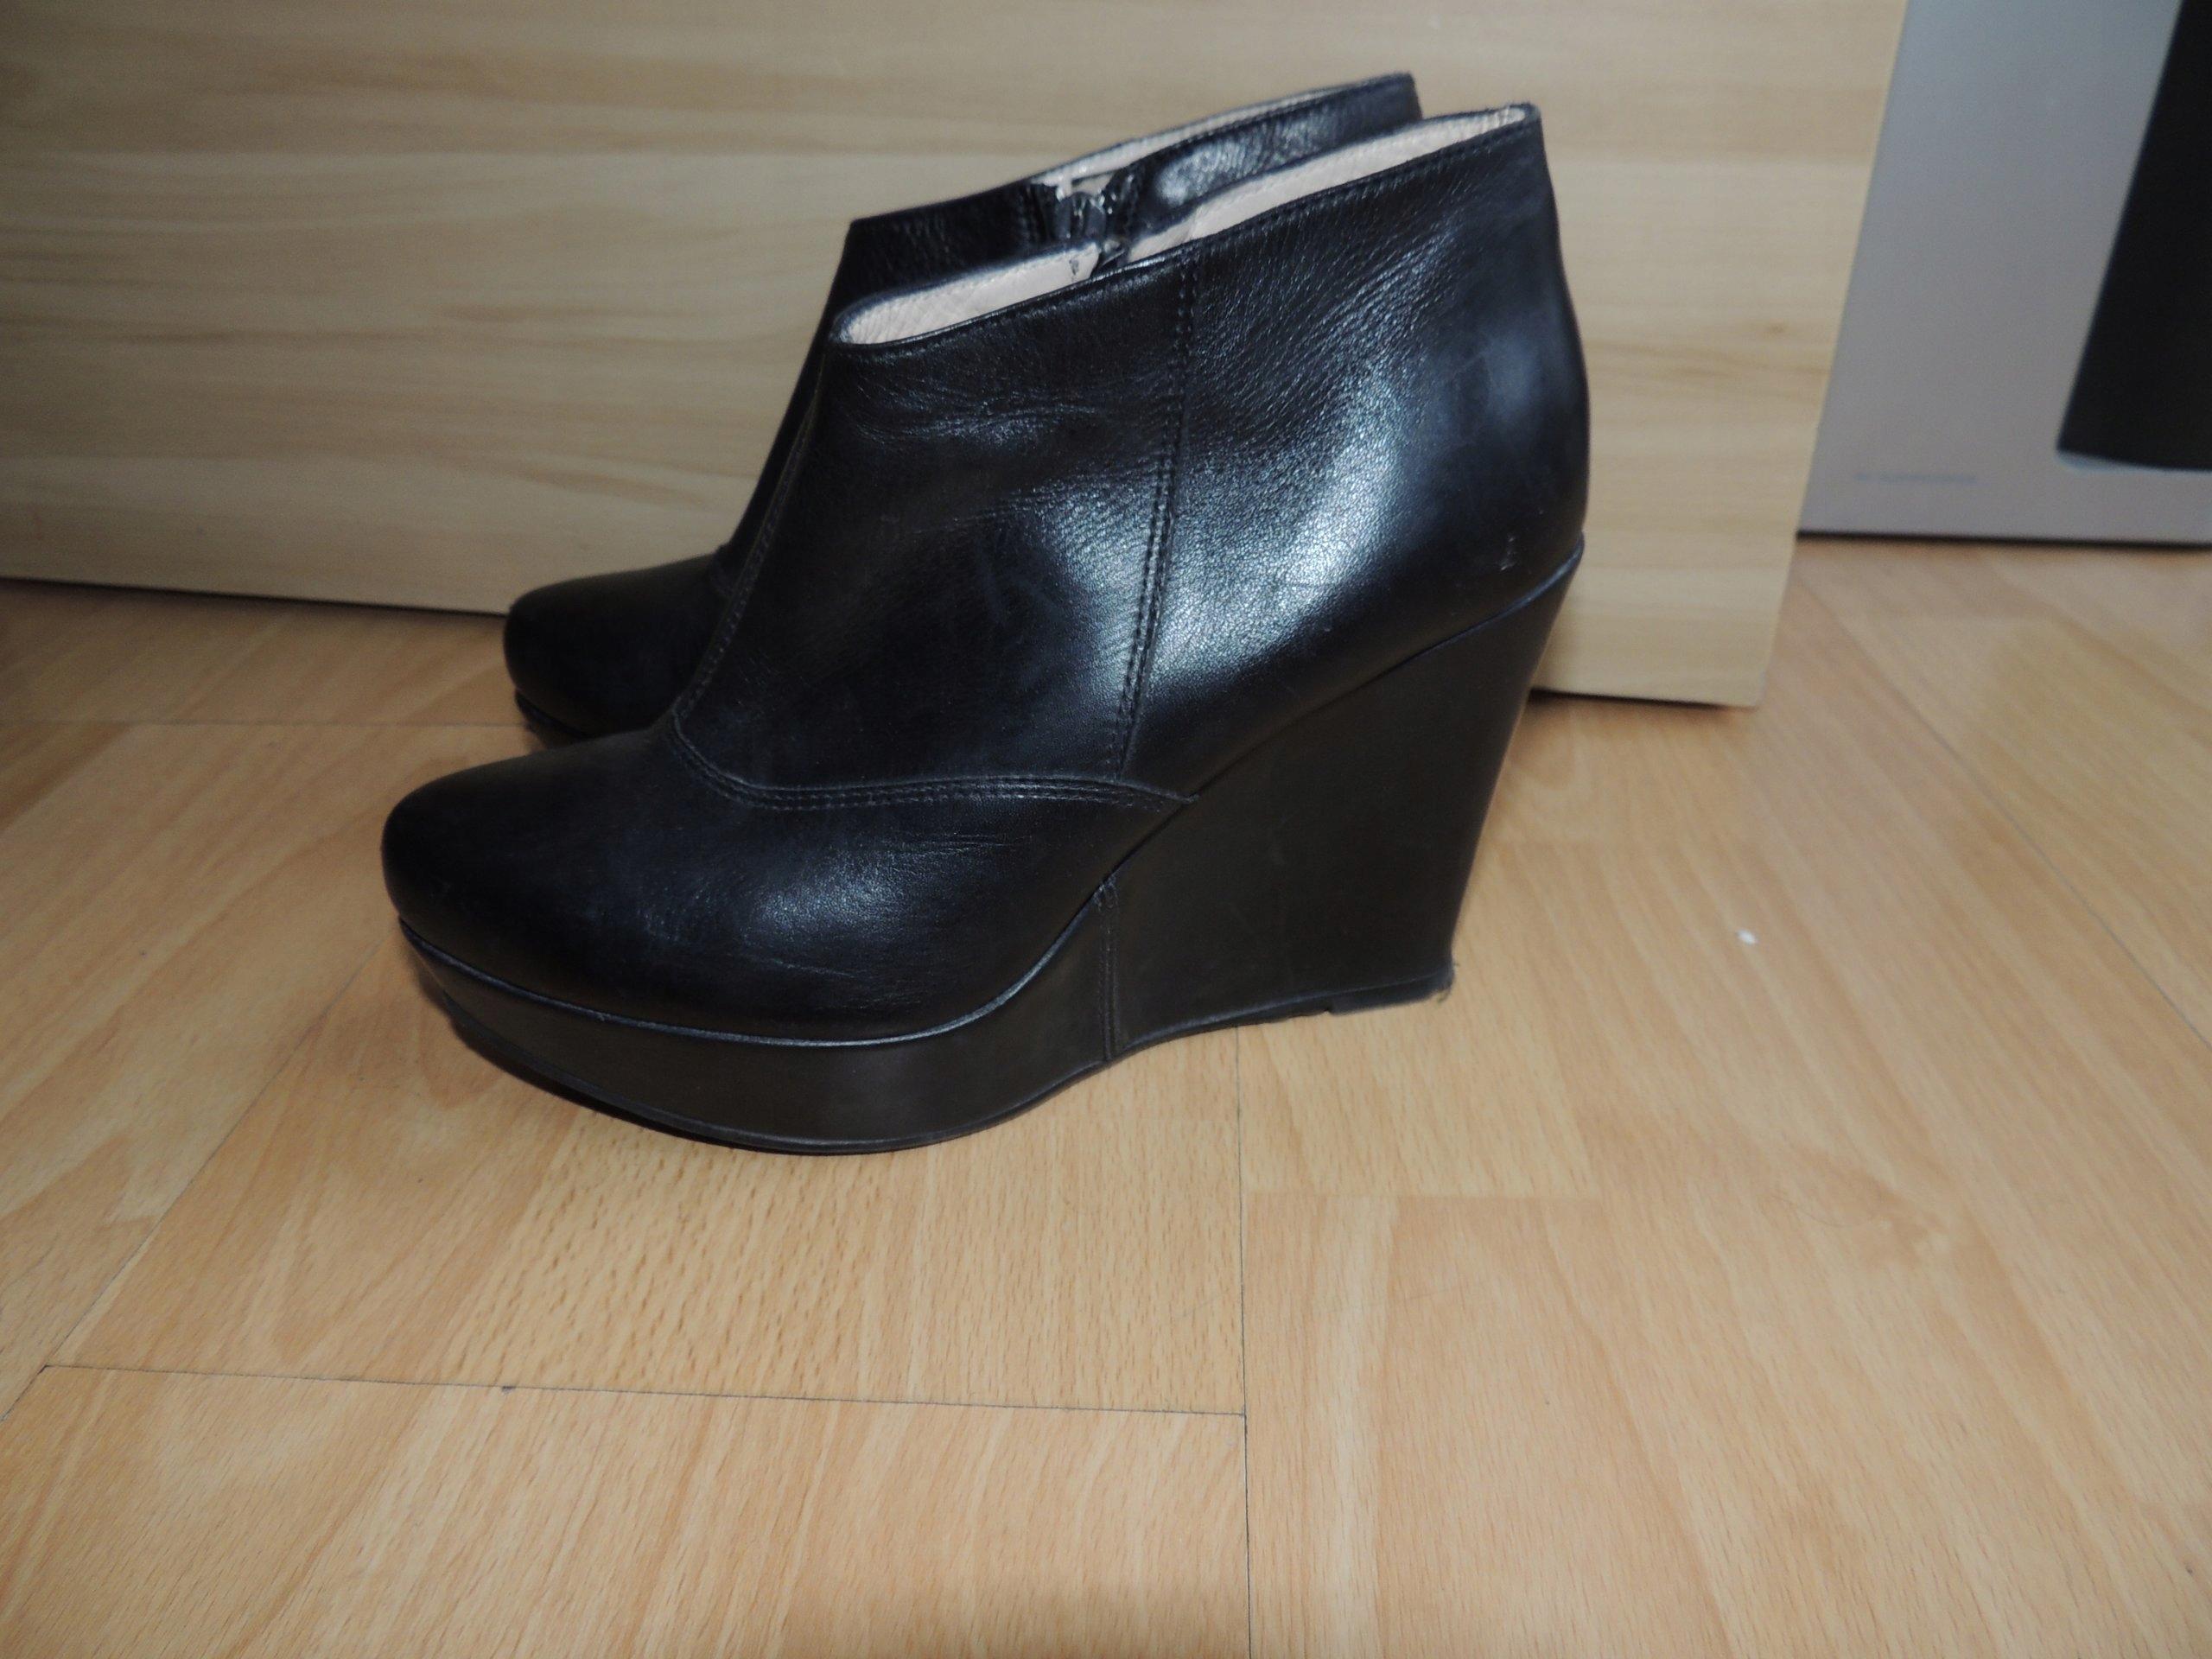 b6474e0ad6acf Buty botki sneakers WOJAS 37 BDB koturn - 7581080549 - oficjalne ...